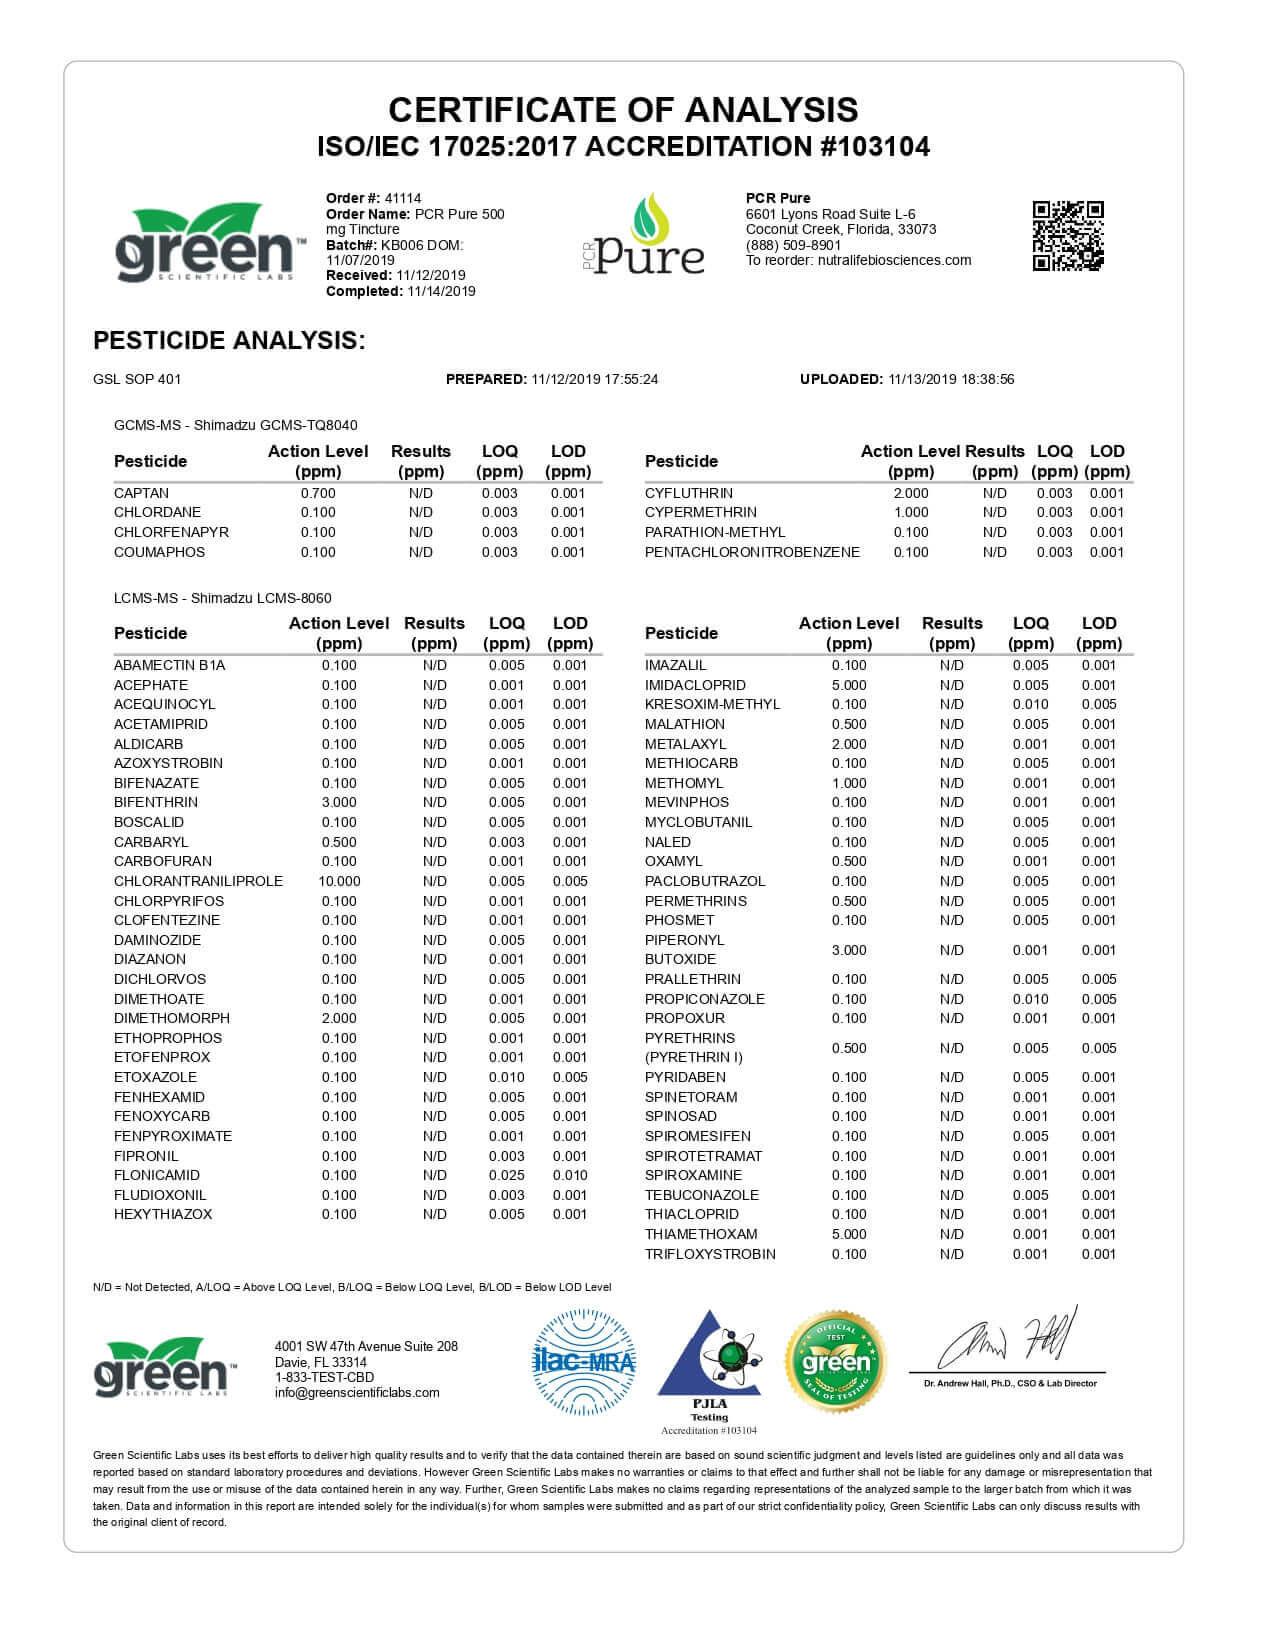 PCR Pure CBD Tincture Spray Full Spectrum 500mg Lab Report